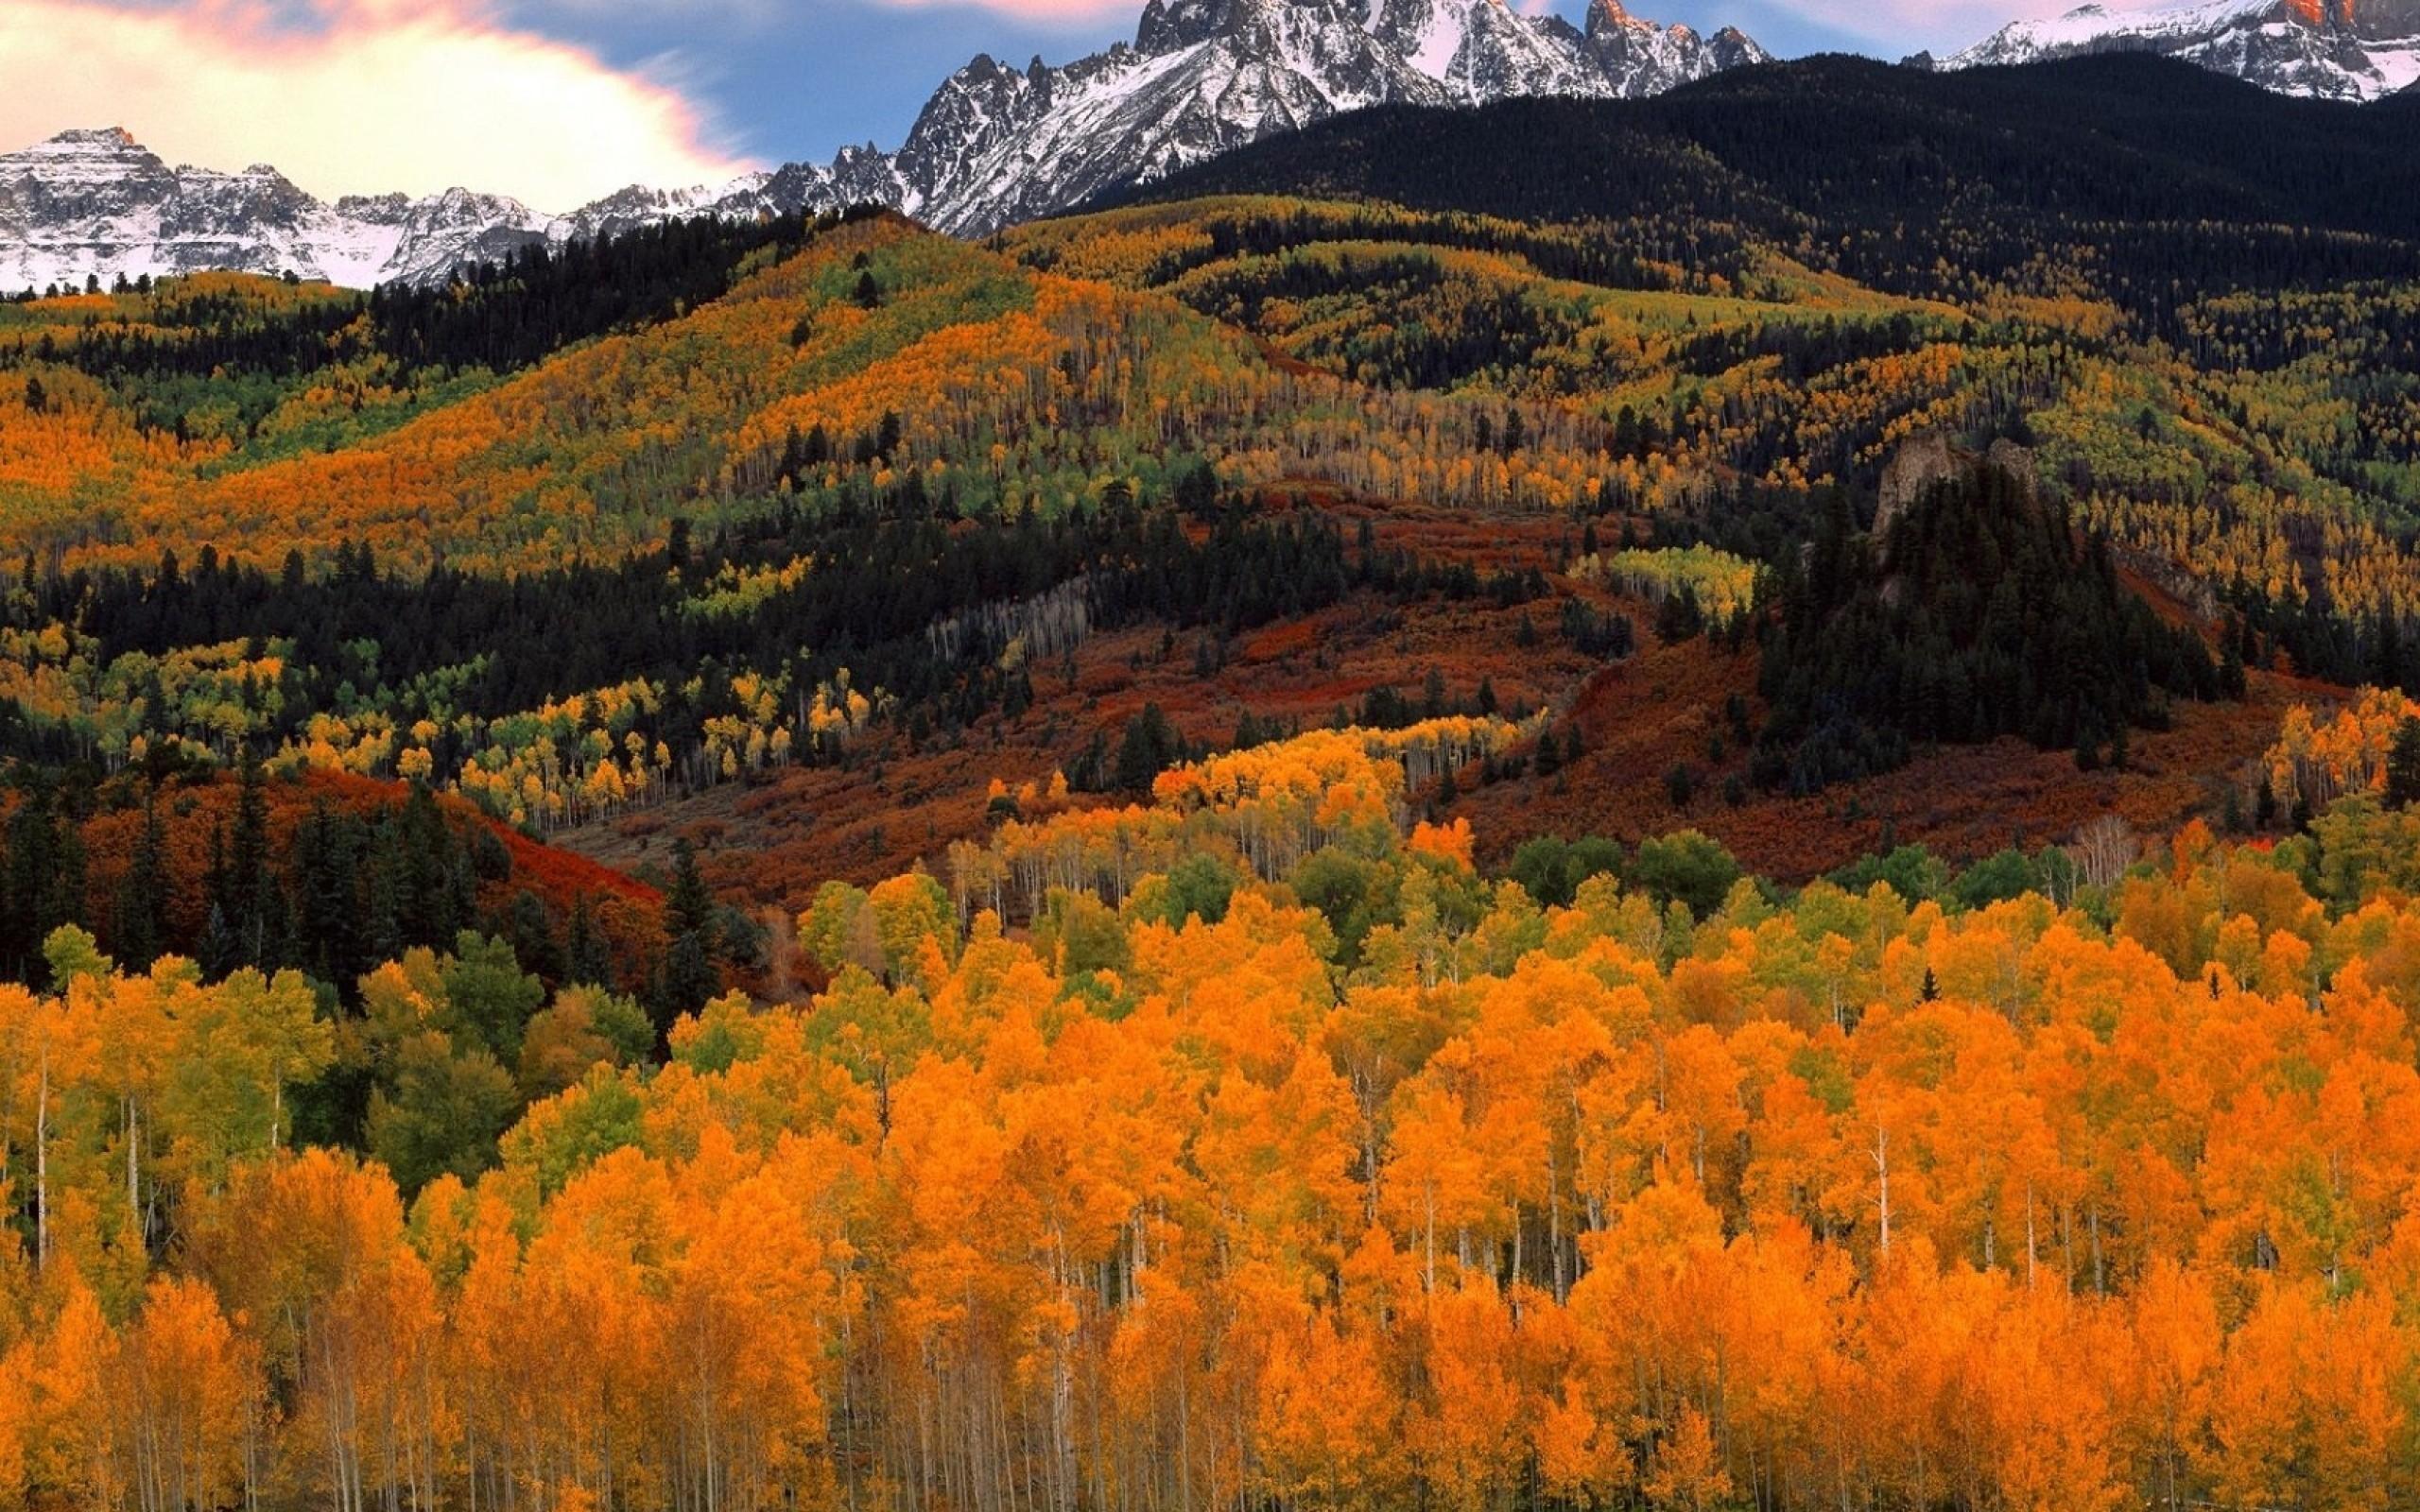 Autumn Mountain Wallpaper Hd